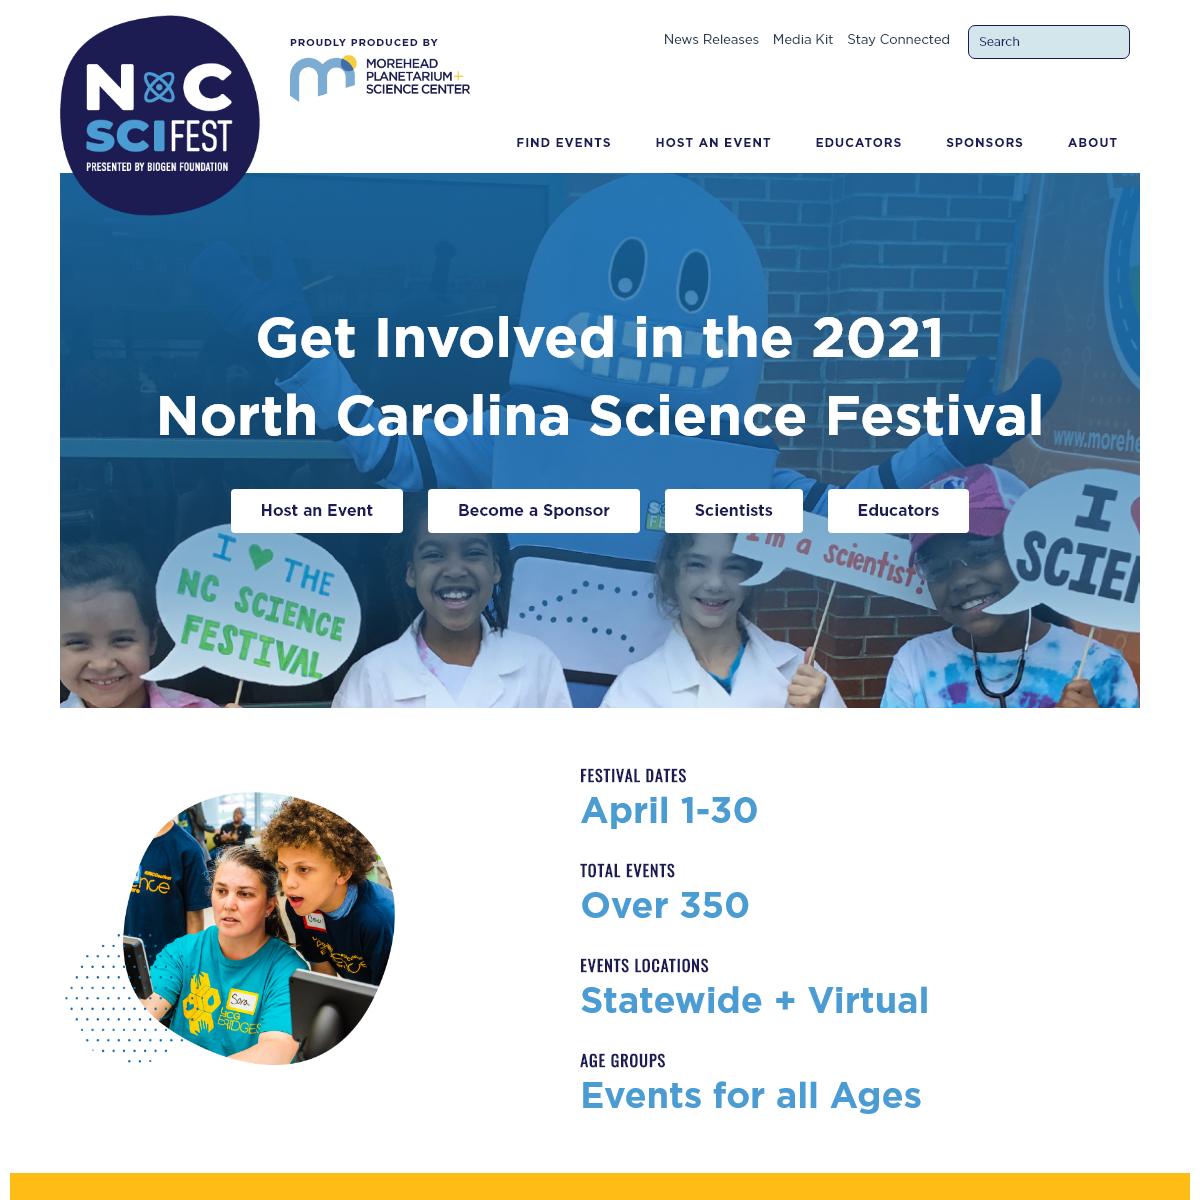 North Carolina Science Festival - Science for All